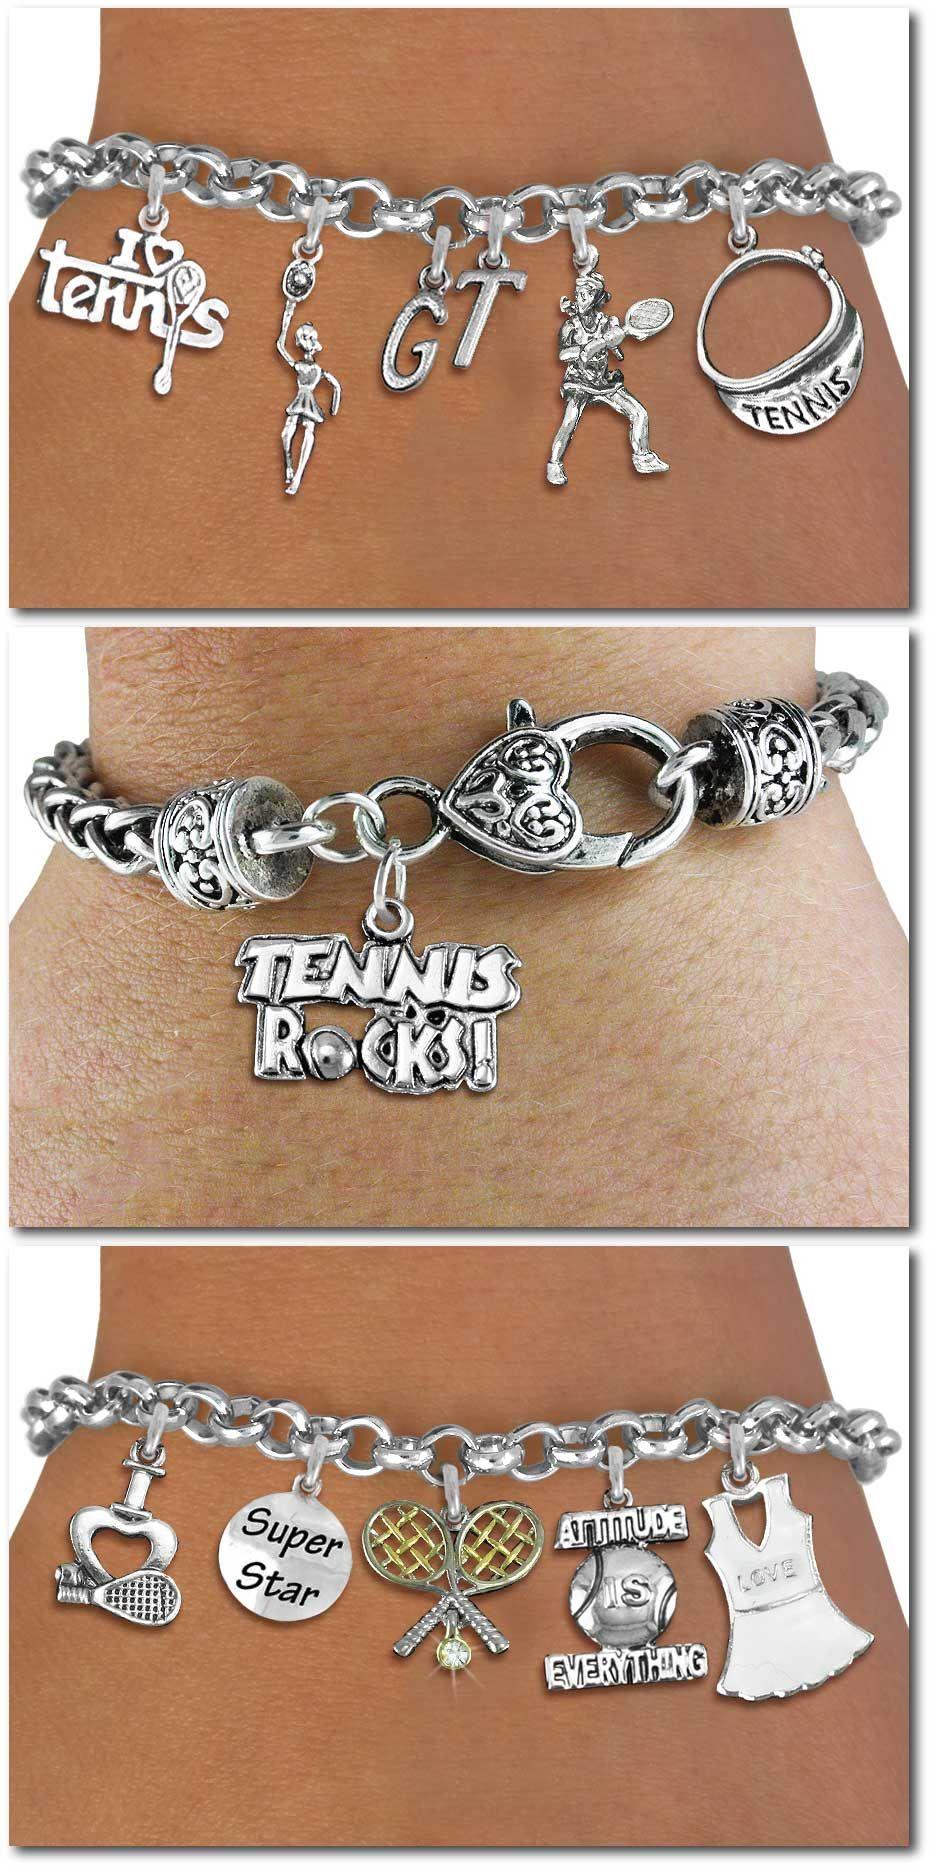 879fdd7a0 Tennis Five Charm bracelet - Silver Chain Bracelet W Silver Charms  Personalize W Initials